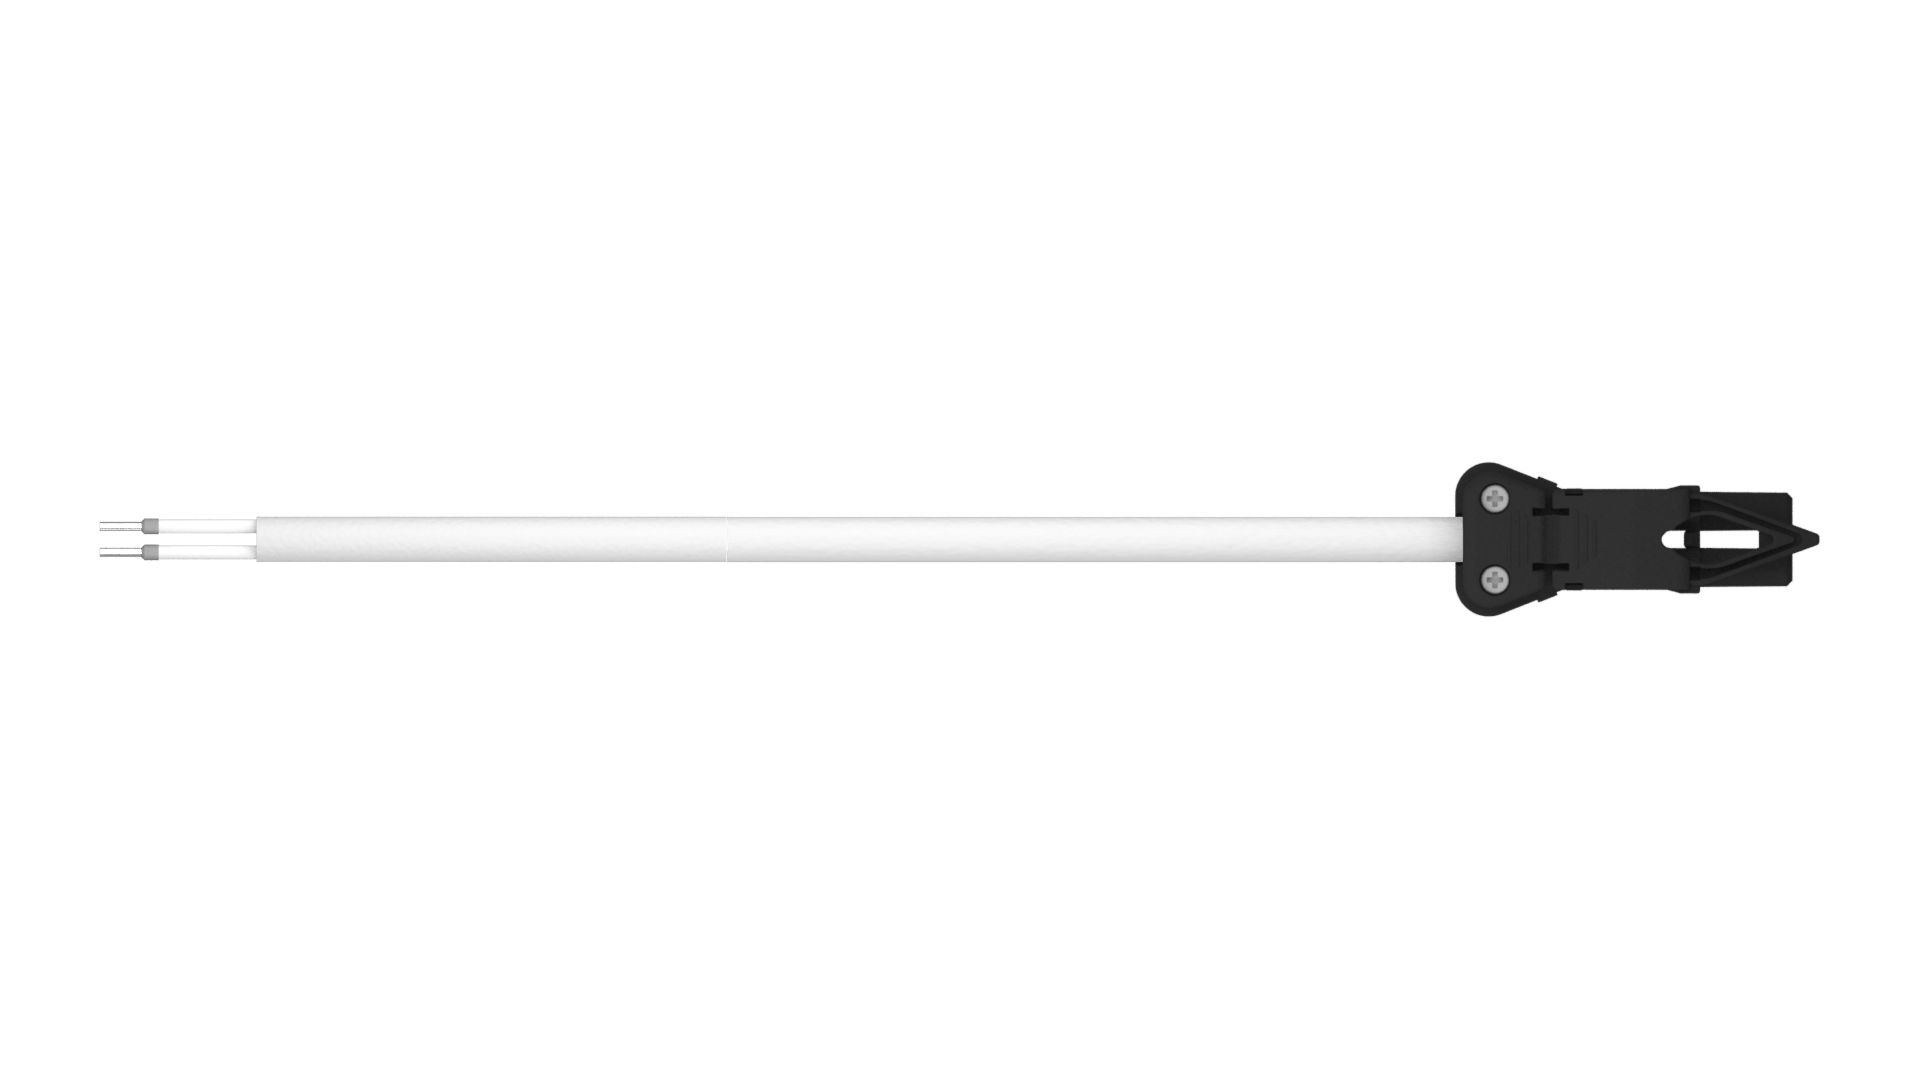 Cable inicio puntera final 1 conector SA 1H 2P negro_HR_zoom x6